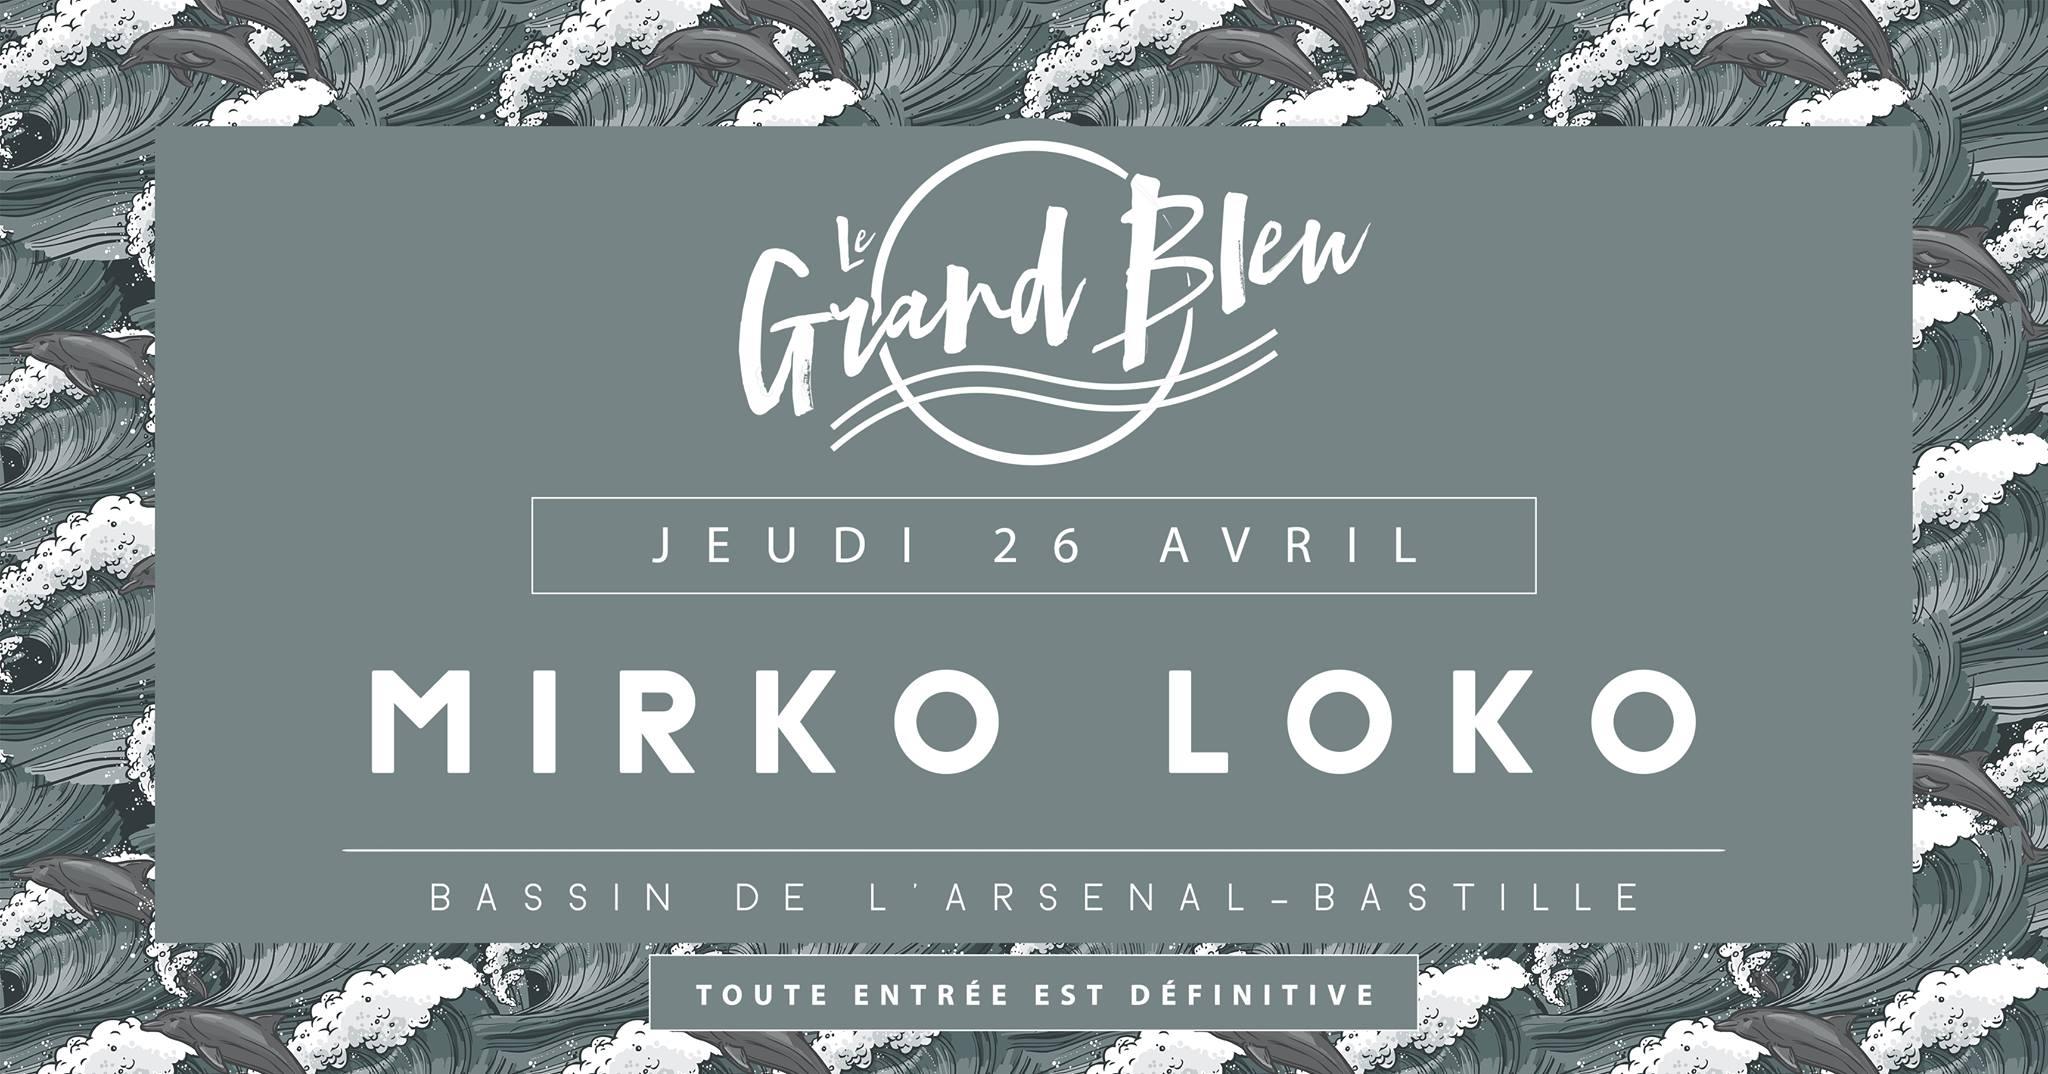 Mirko Loko - @Grand Bleu